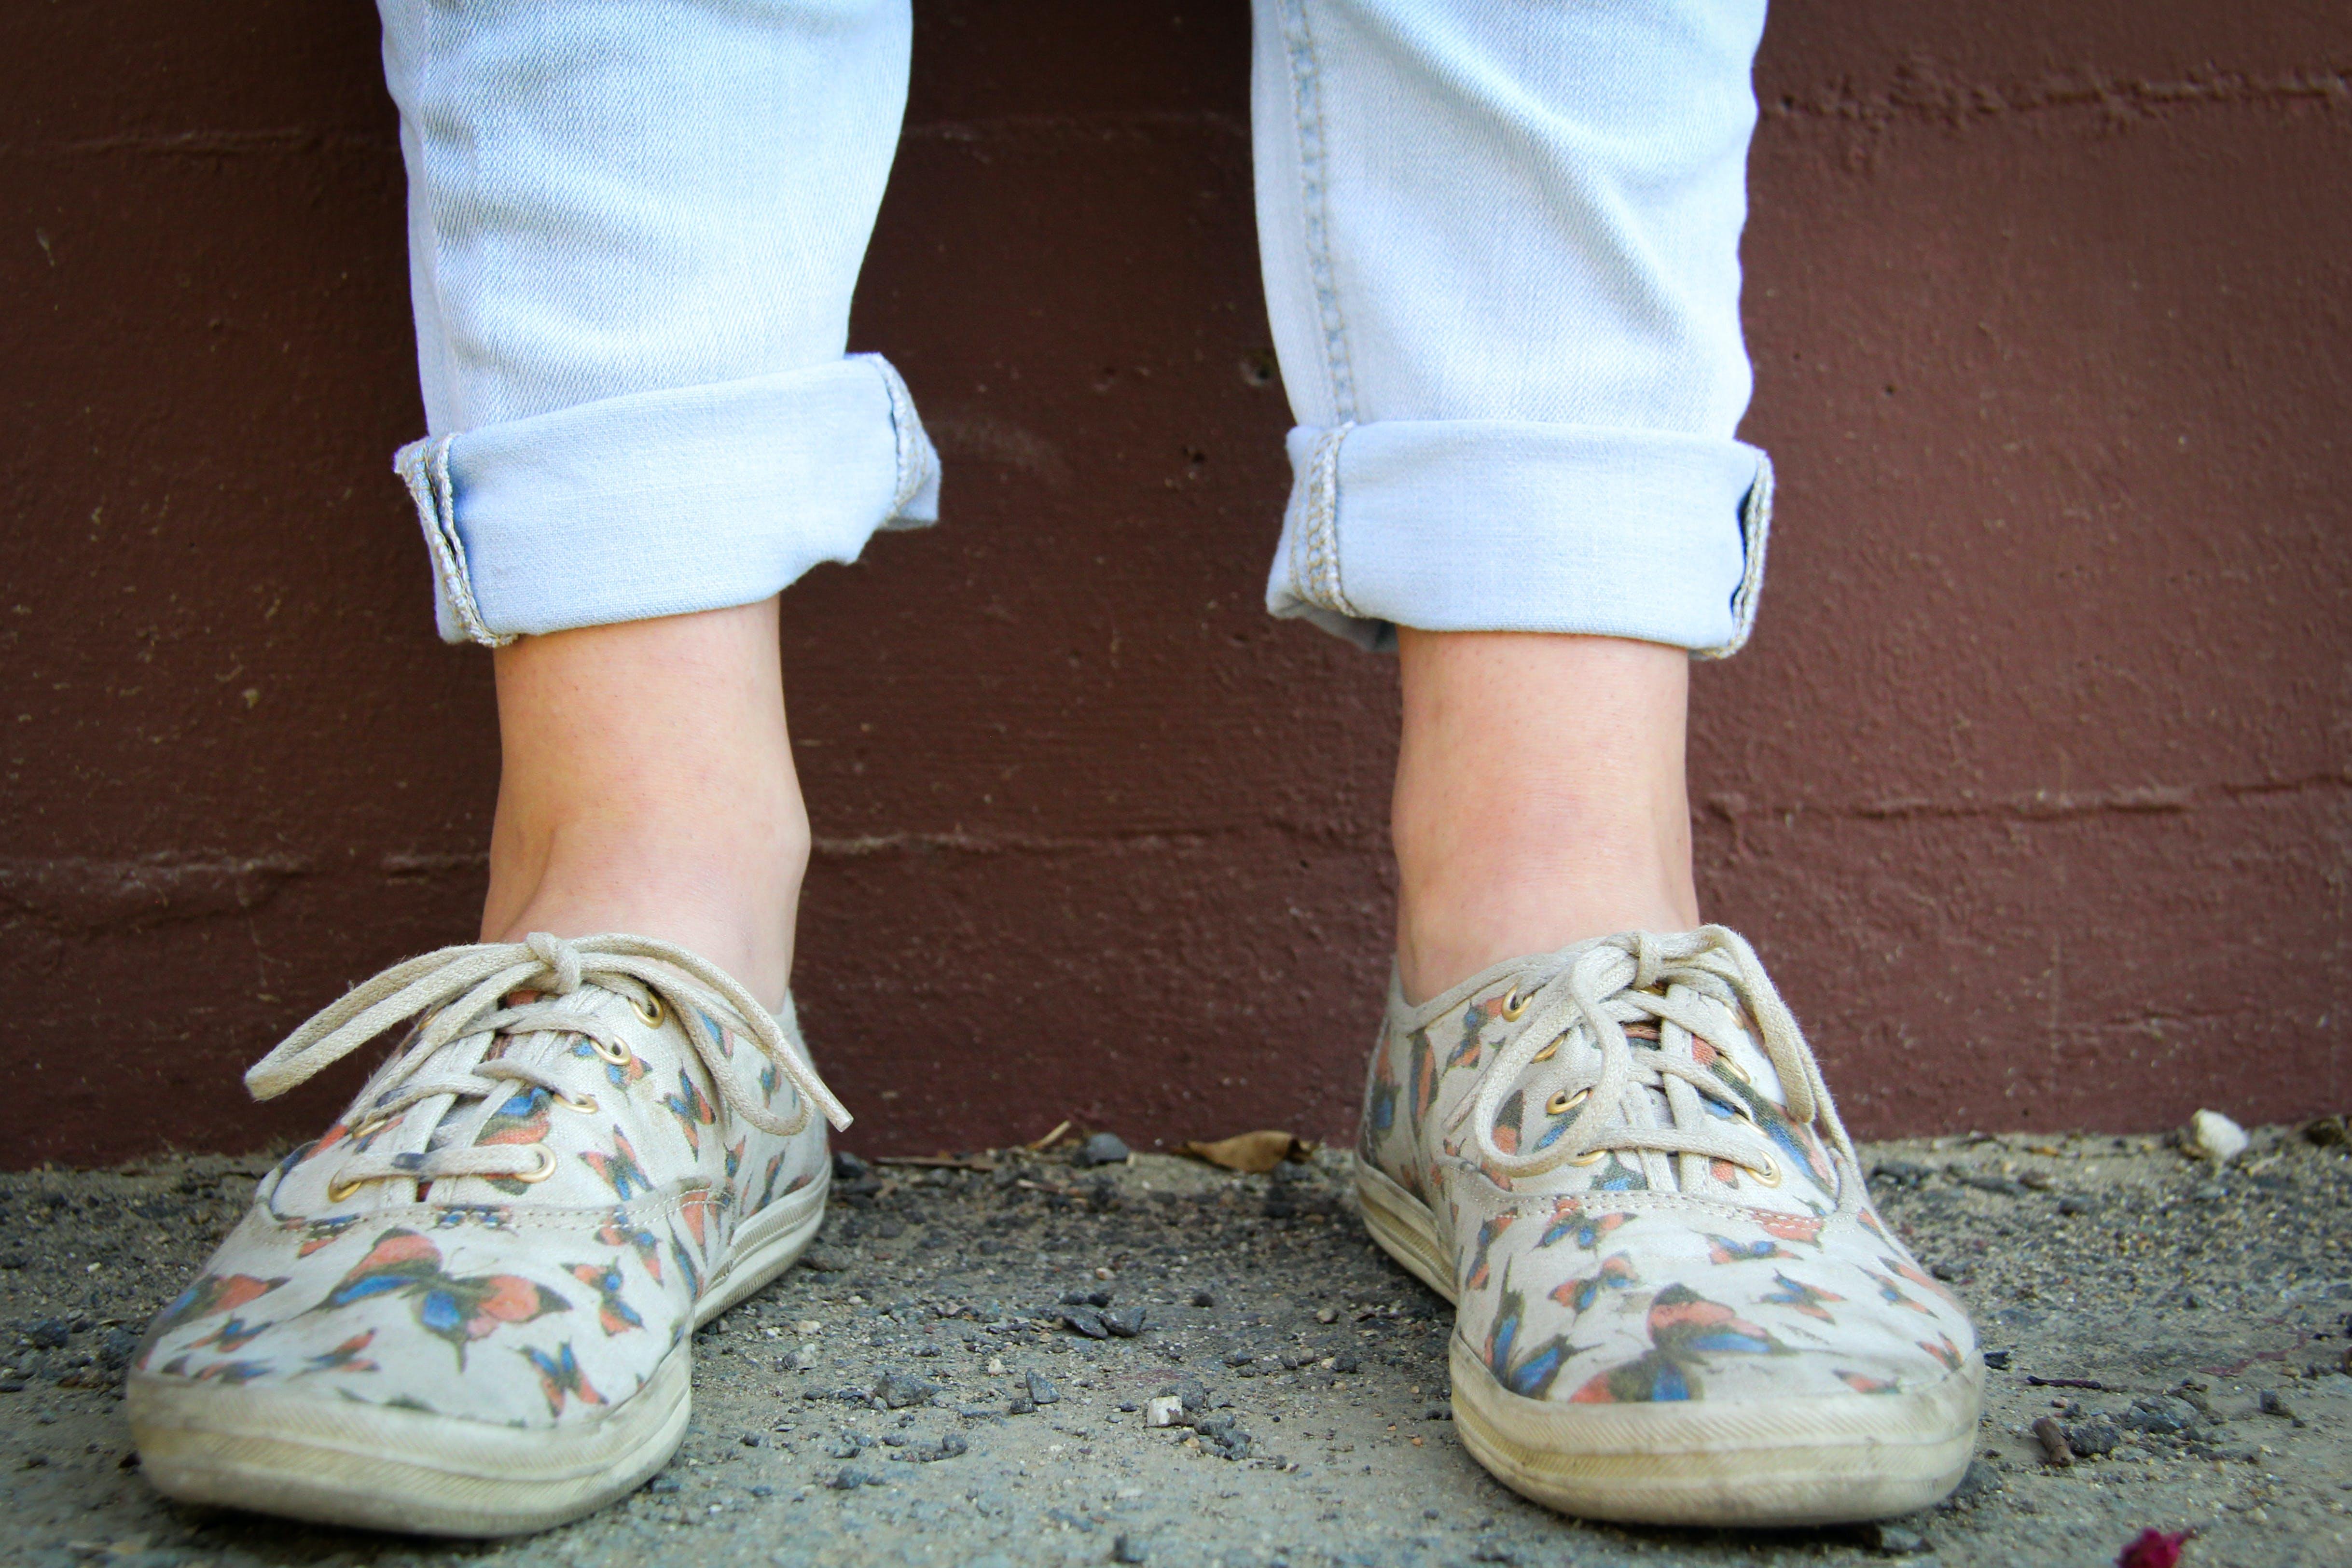 Person Wearing Brown Low-top Sneakers